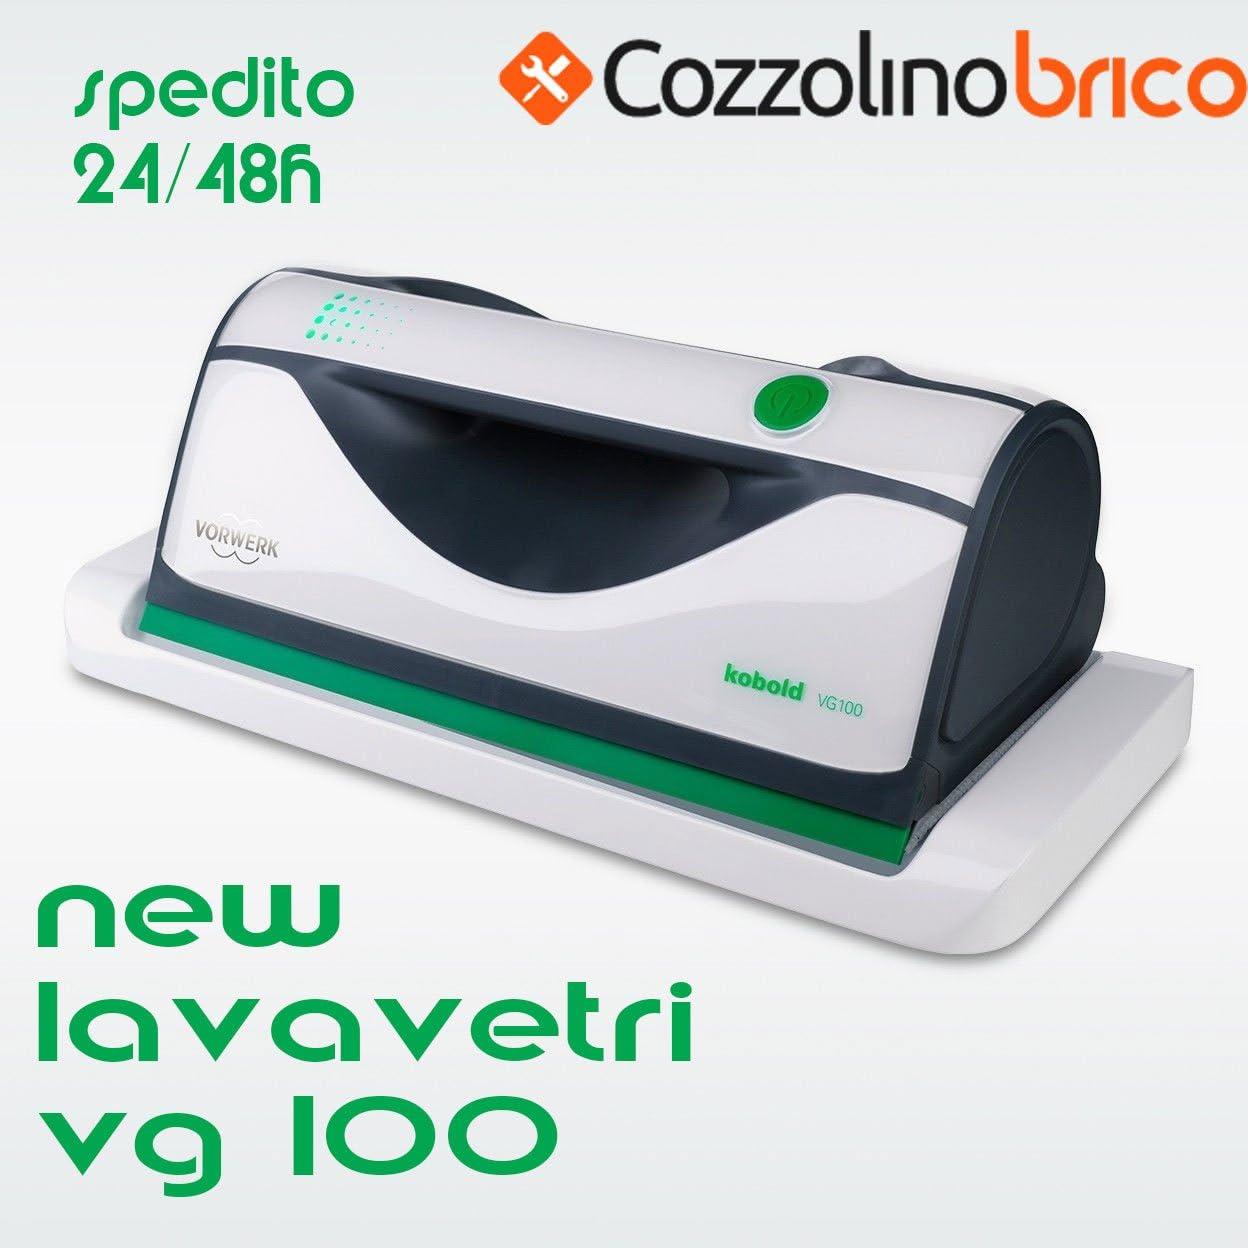 Vorwerk VG 100 - Robot limpiacristales, n.º vk150 y vk140: Amazon ...